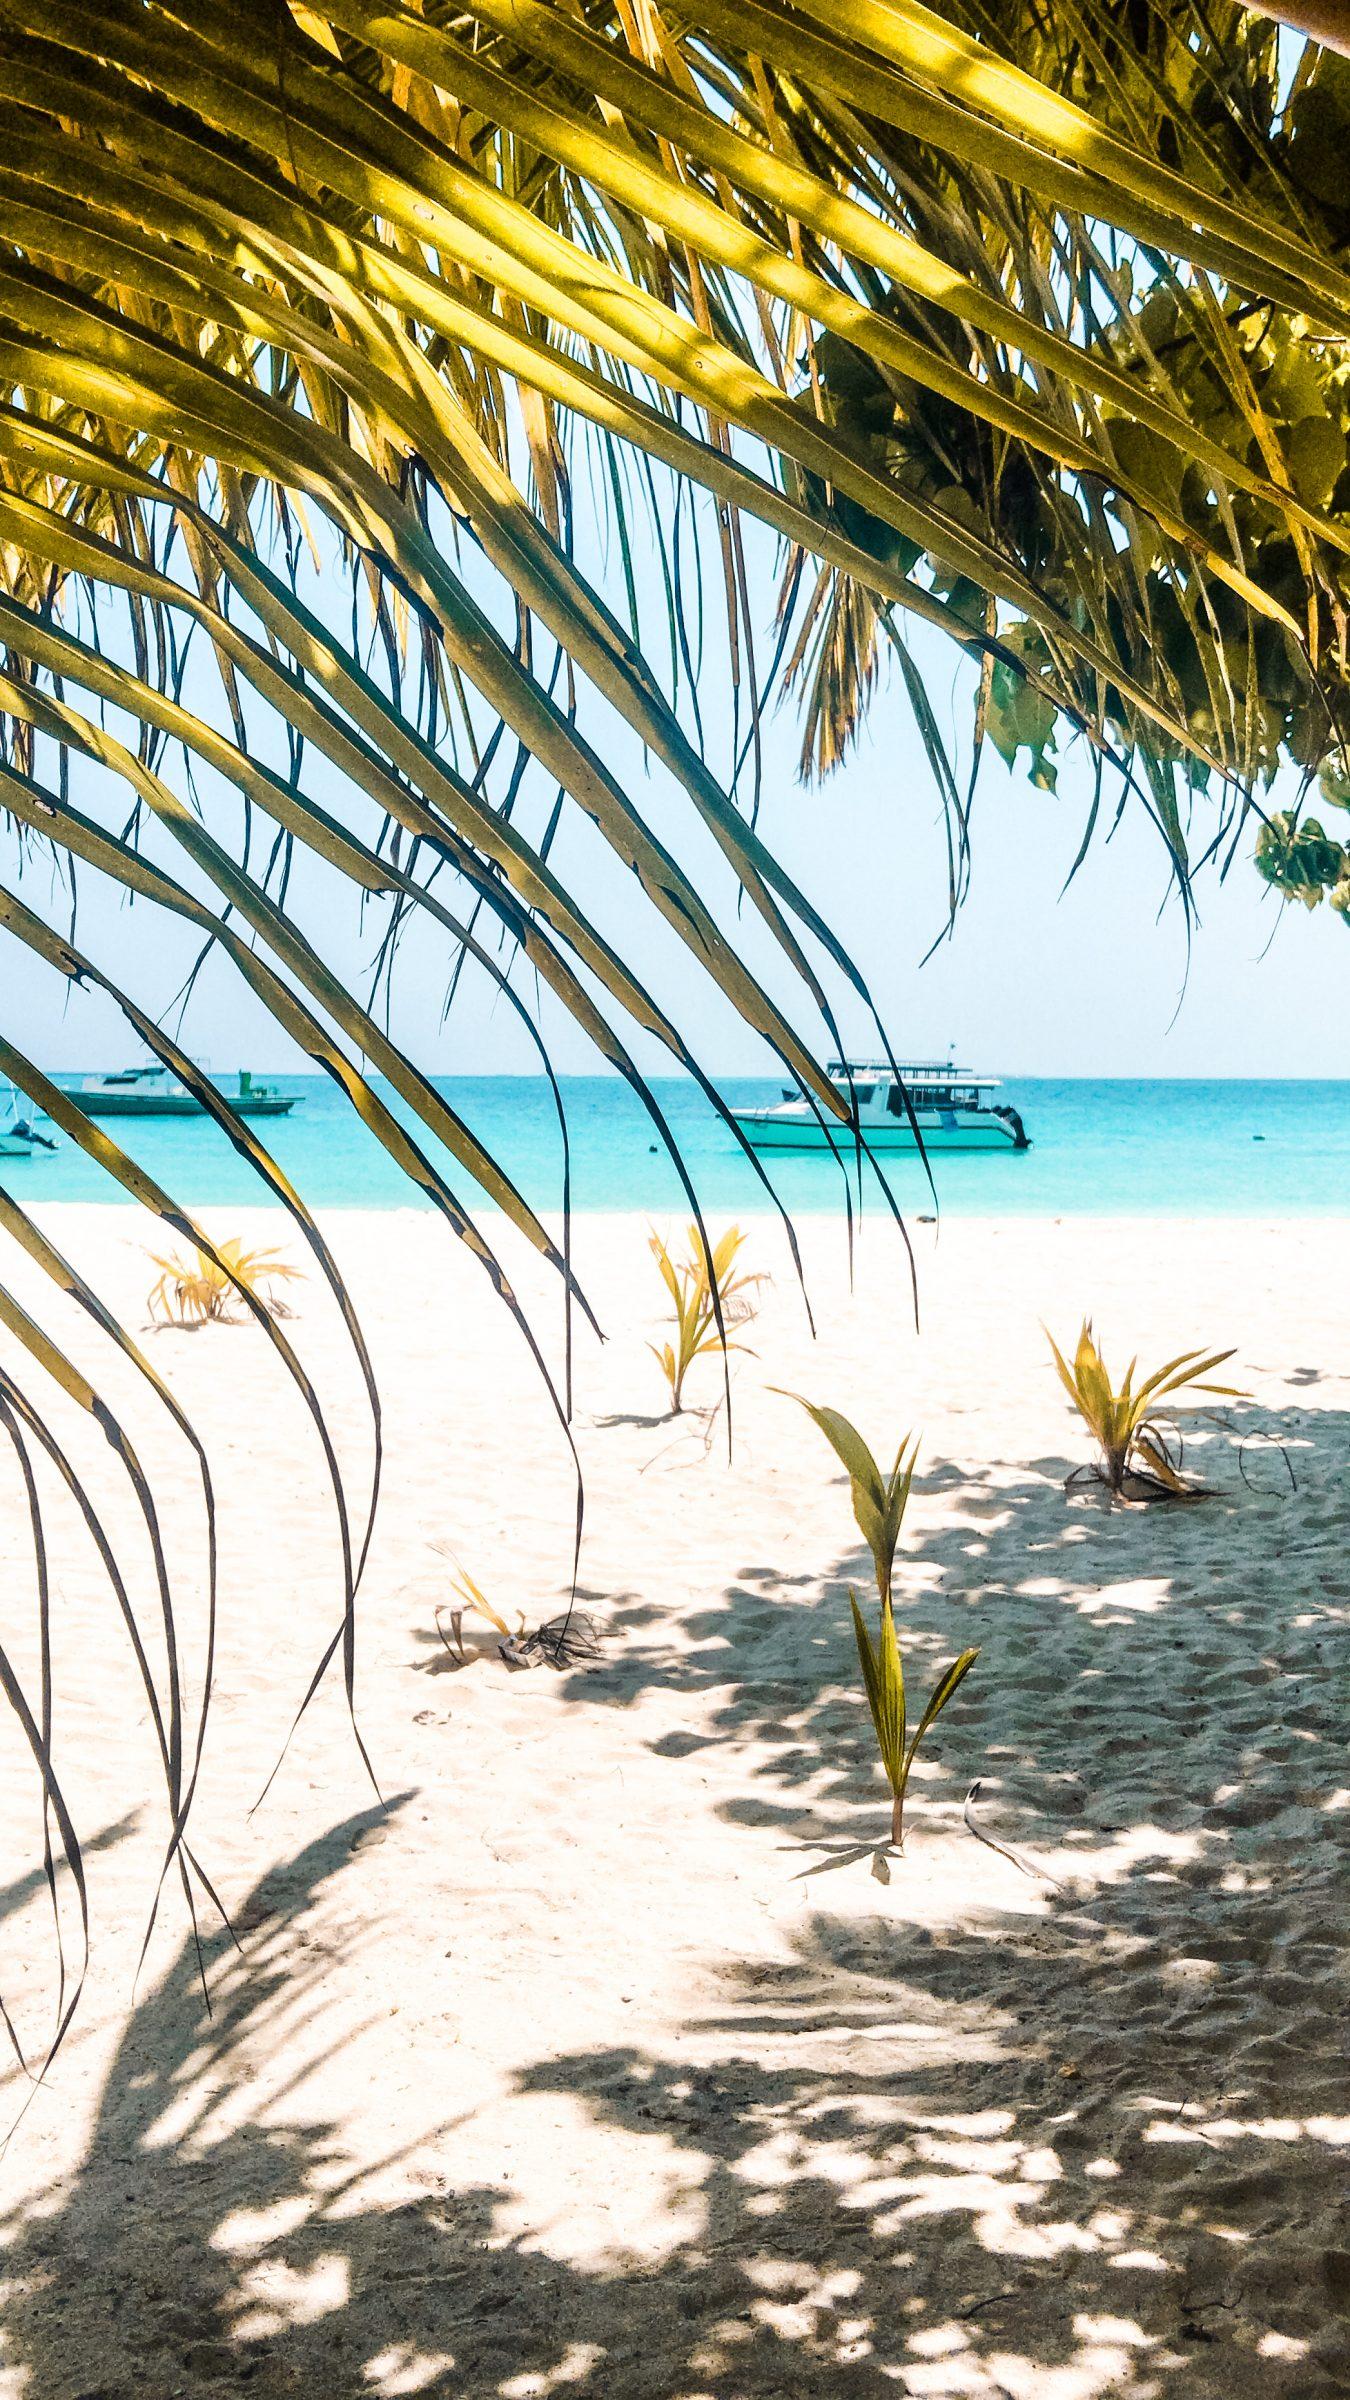 Wat te doen op de Malediven